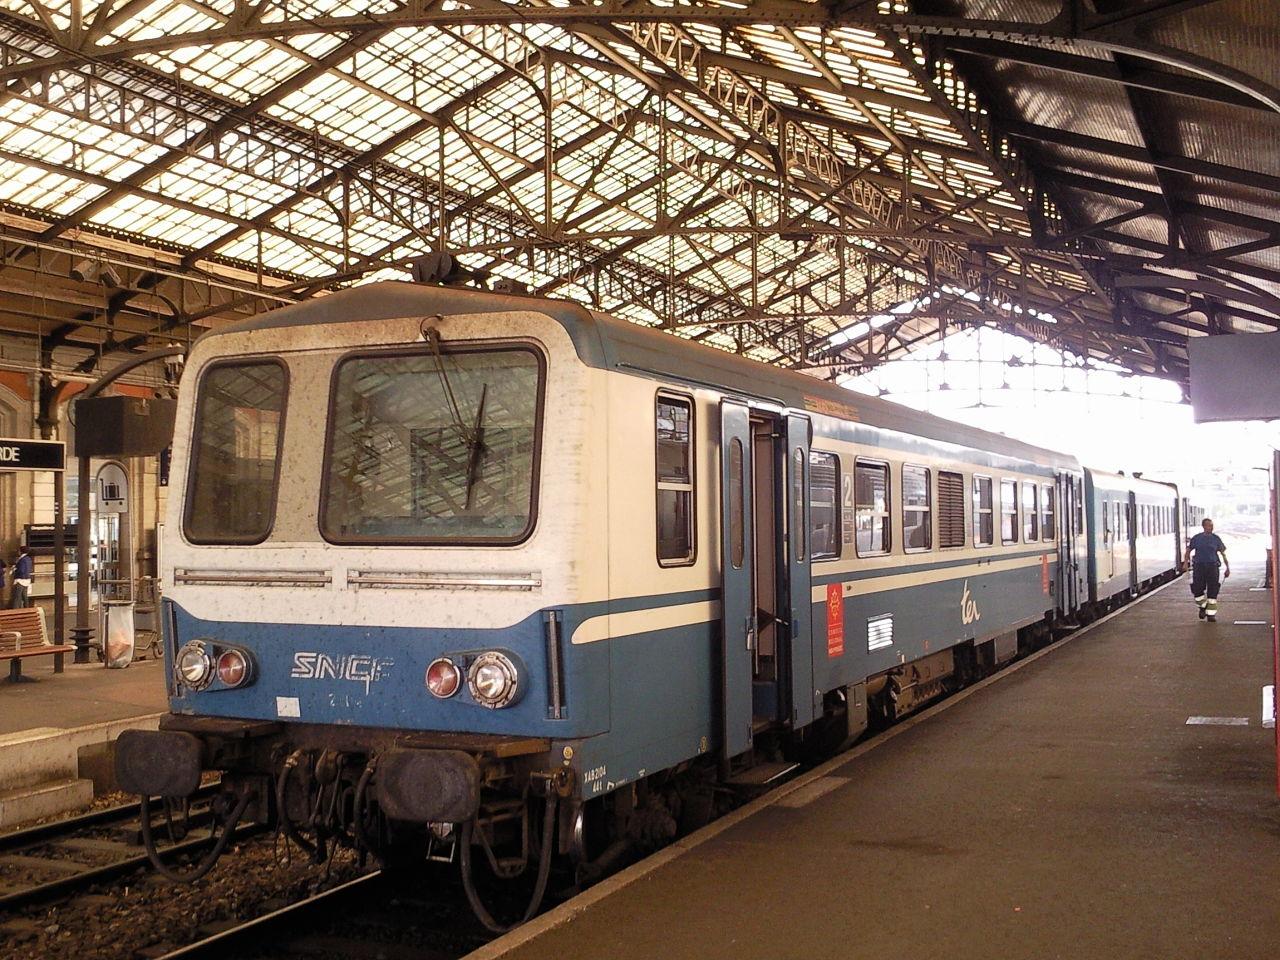 Brive-la-gaillarde-train-station